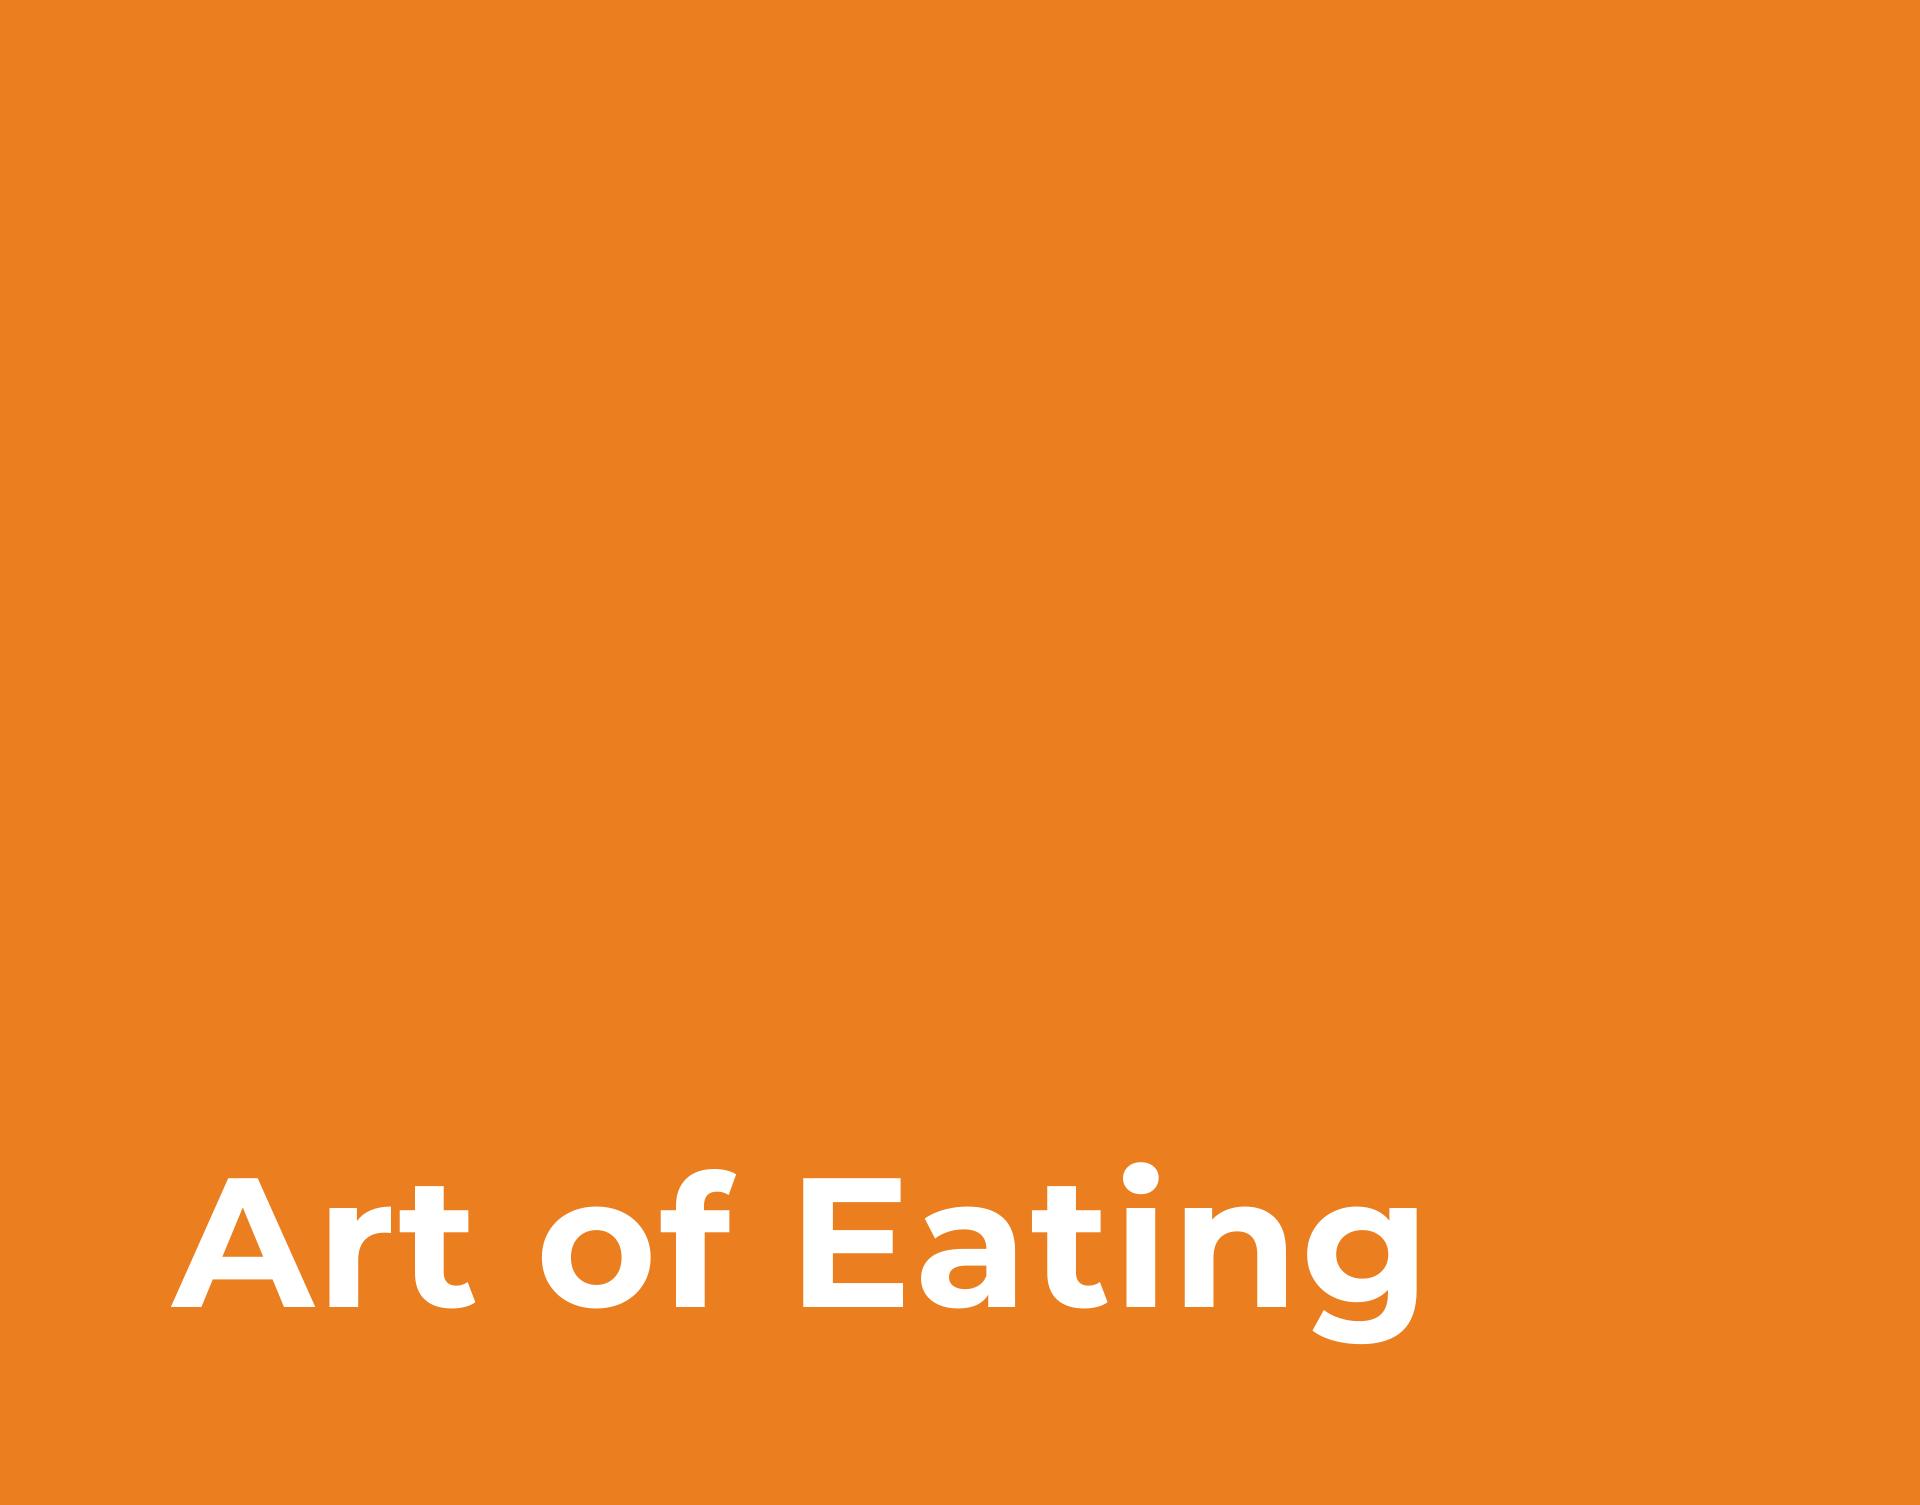 Art of Eating Block